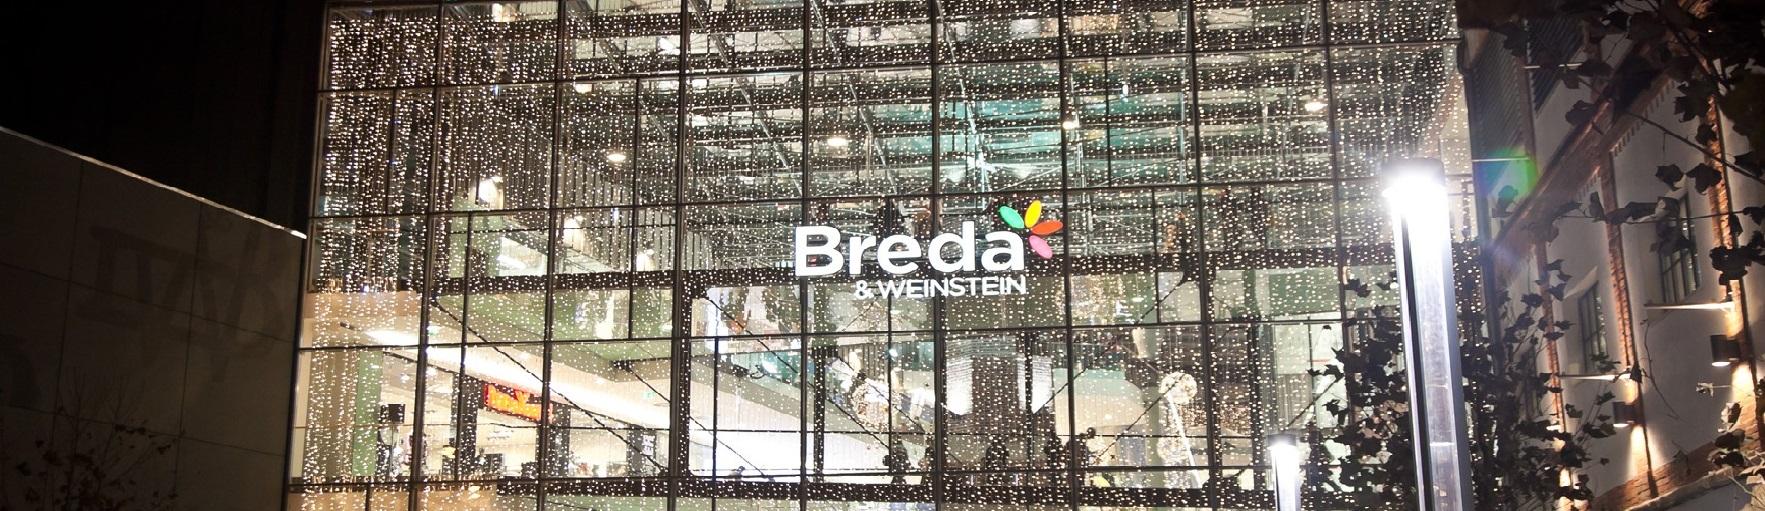 breda_2